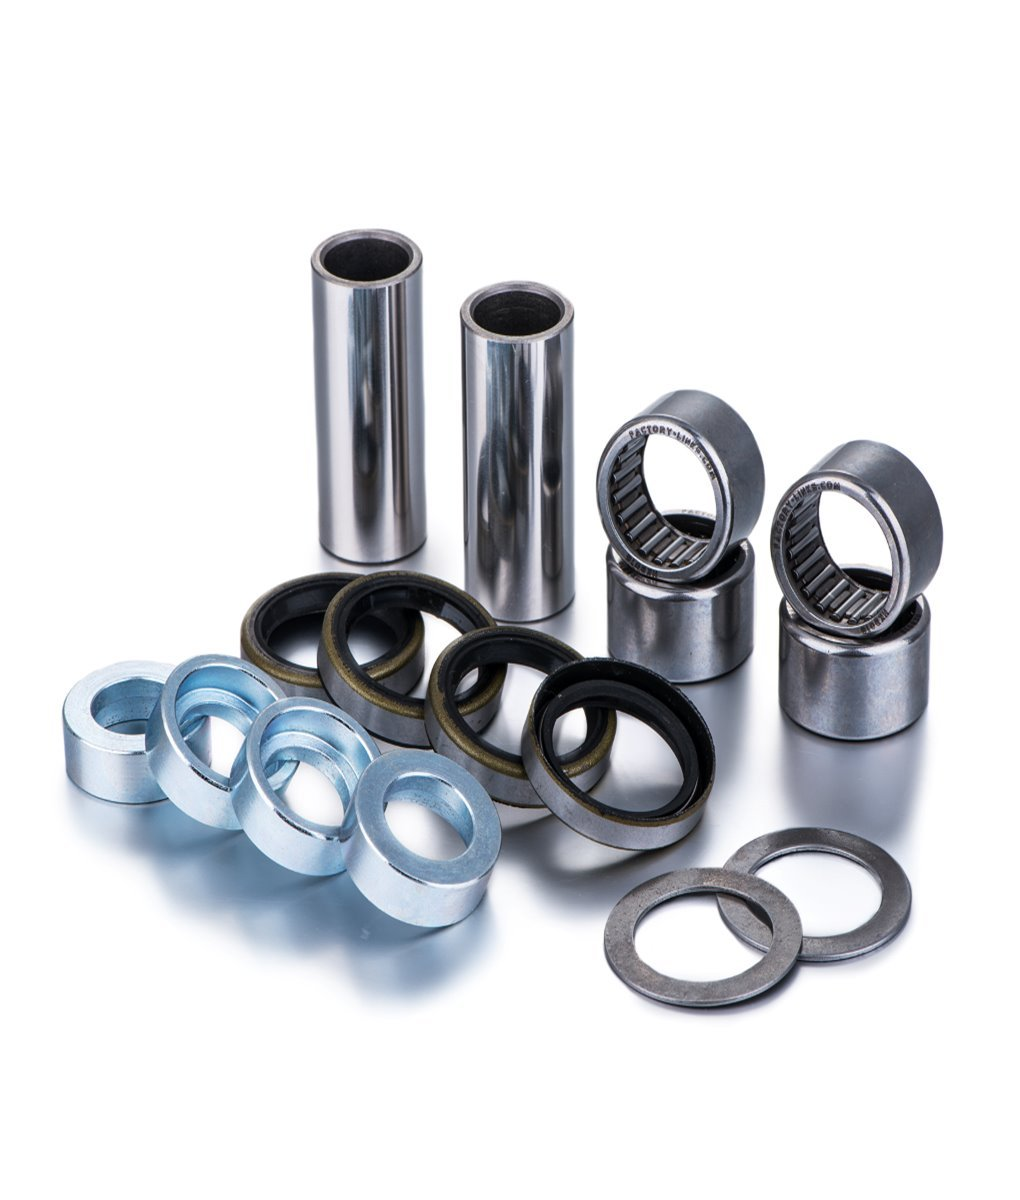 Factory-Links 1995-2004 Swing Arm Bearing Kits SXS 125 200 250 300 360 380 EXC Fits: KTM 125 200 250 300 360 380 SX 125 200 250 300 360 380 MXC : 125 200 250 300 360 380 EGS